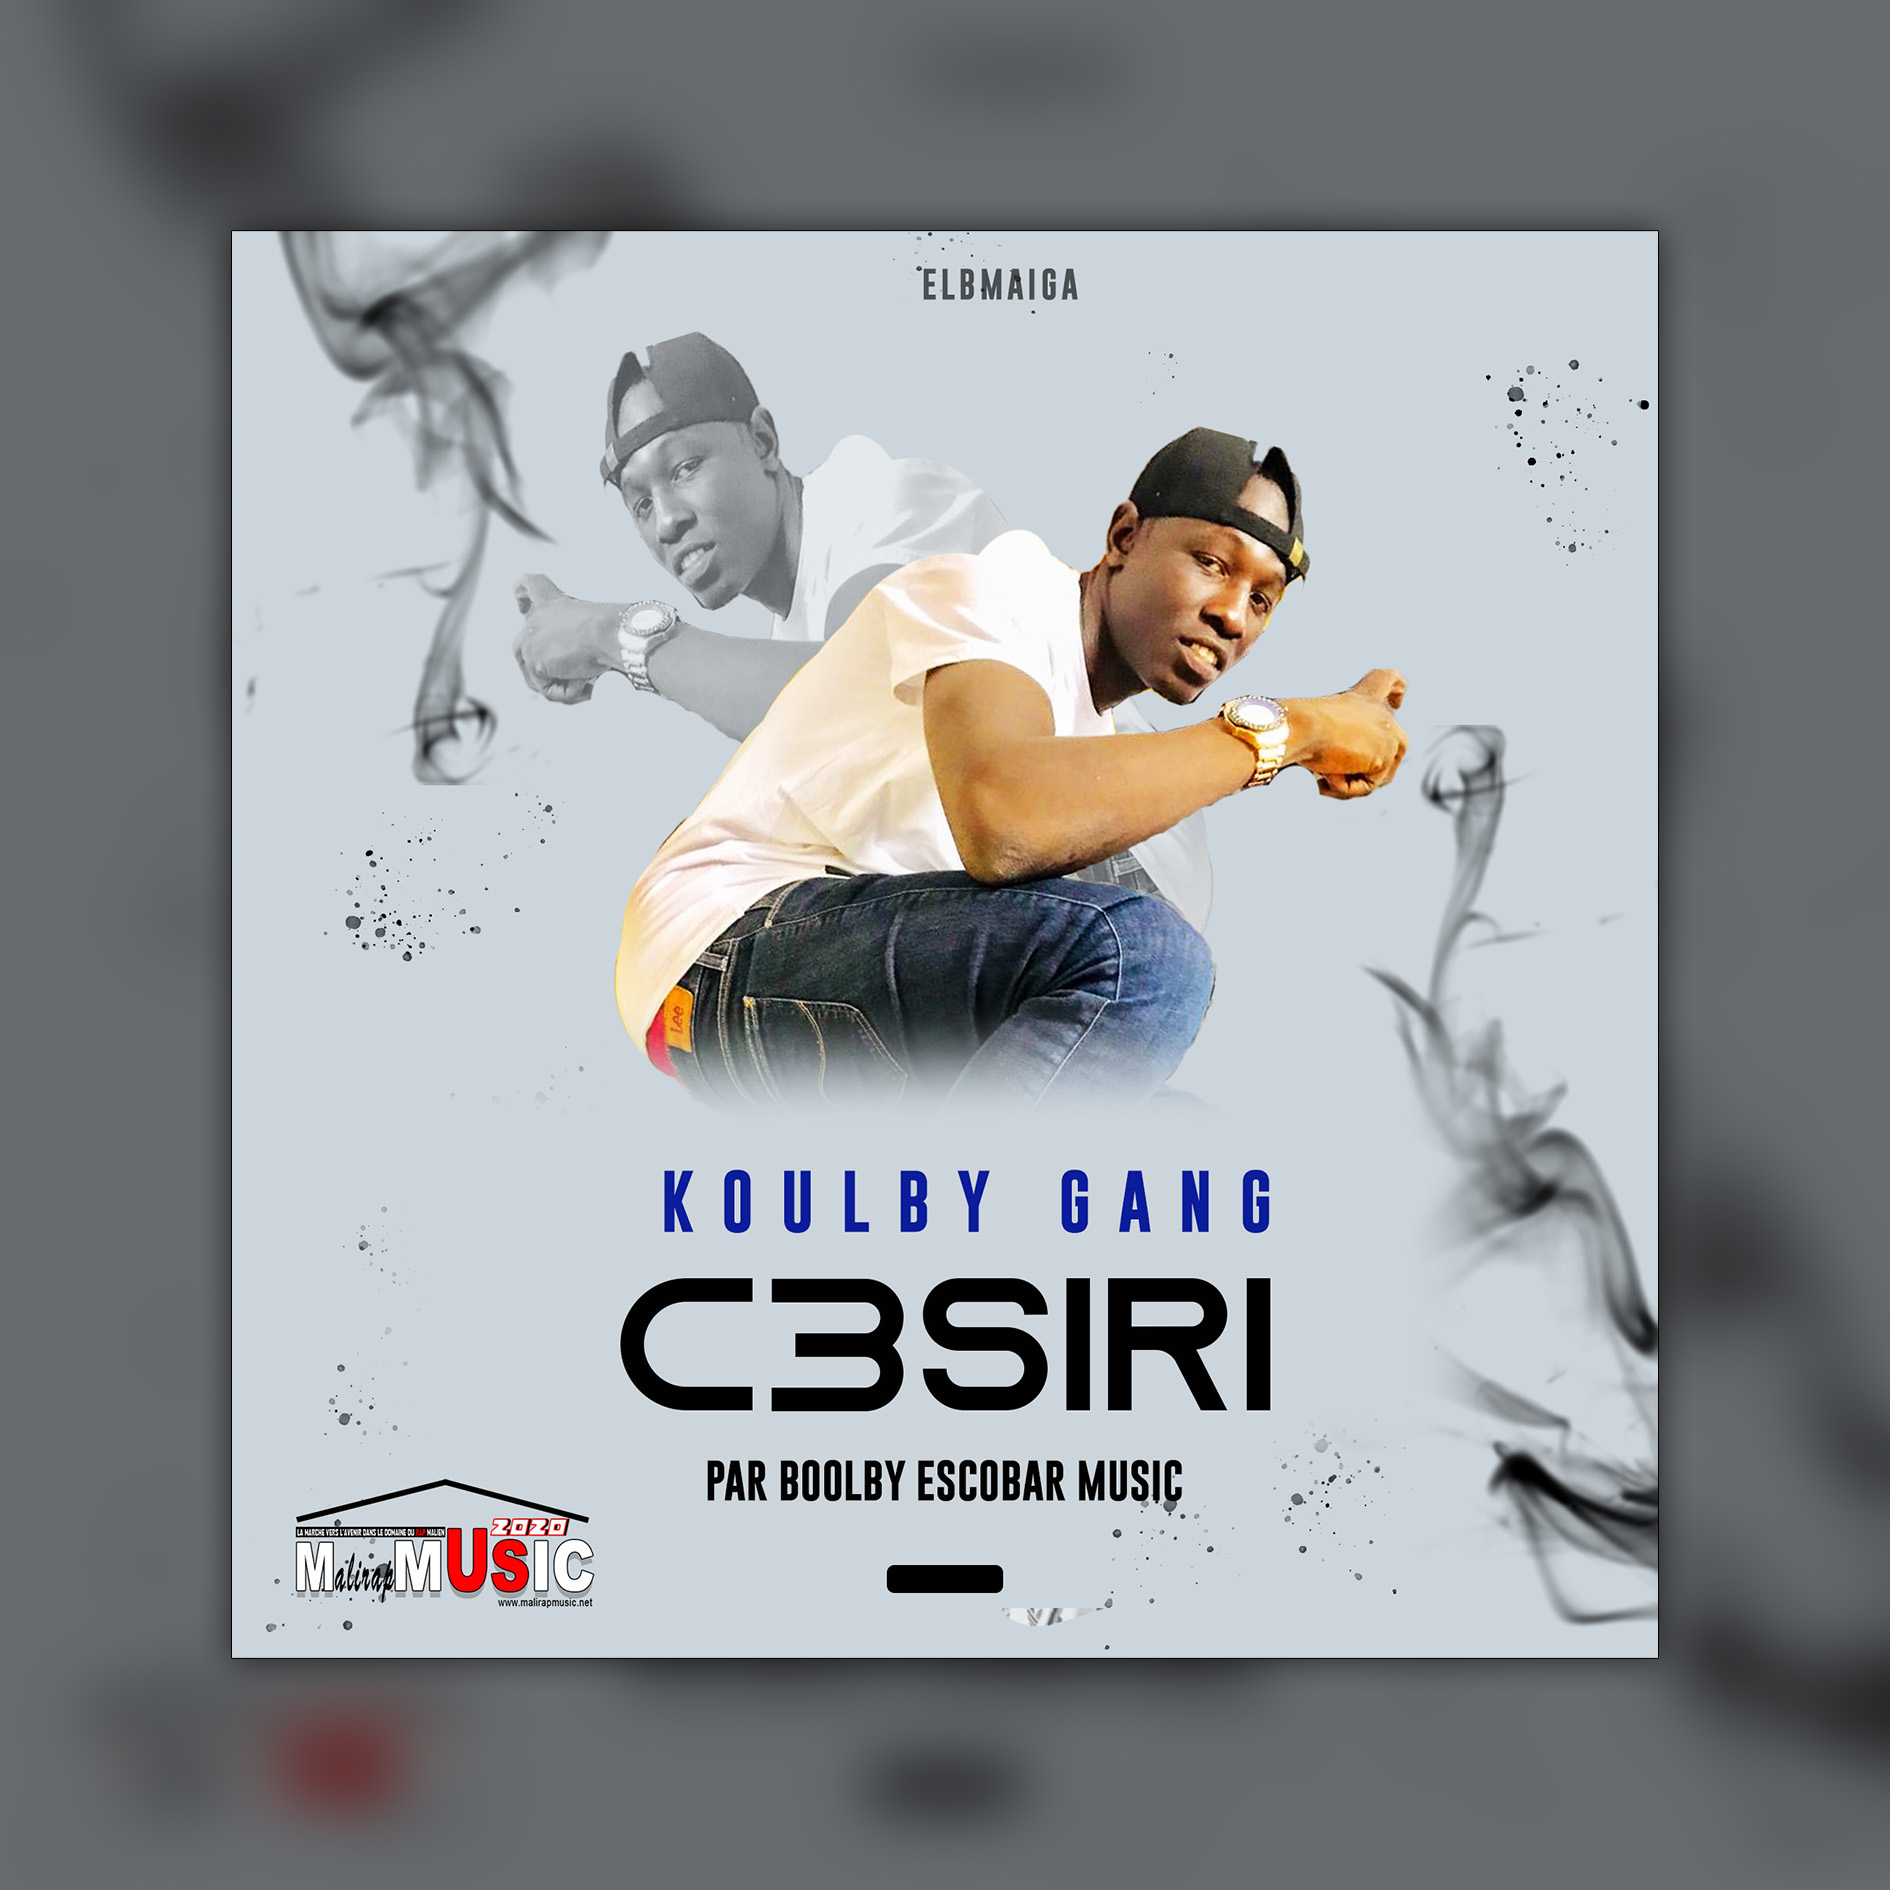 KOULBY GANG – C3SIRI (2020)